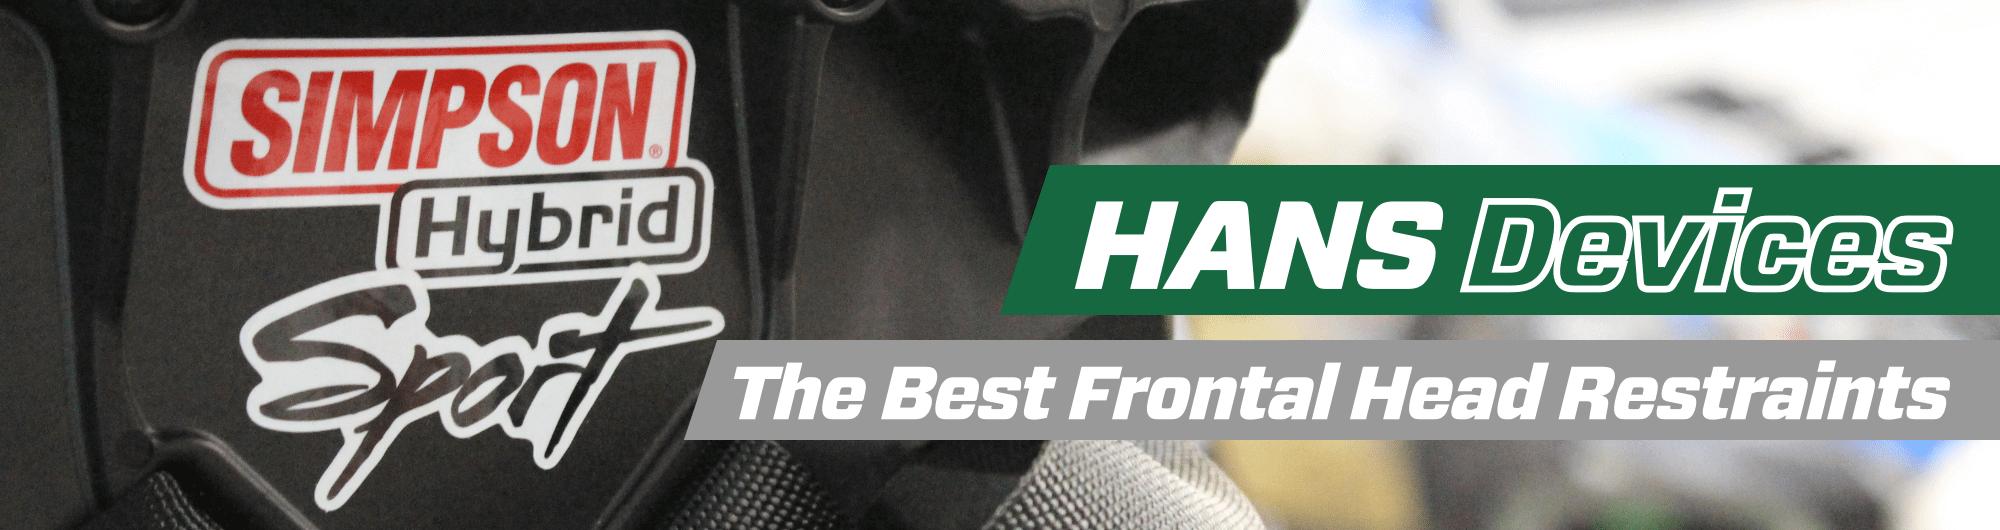 HANS Devices – The Best Frontal Head Restraints – www.gsmotorsport.co.uk Hero Image – October 2017